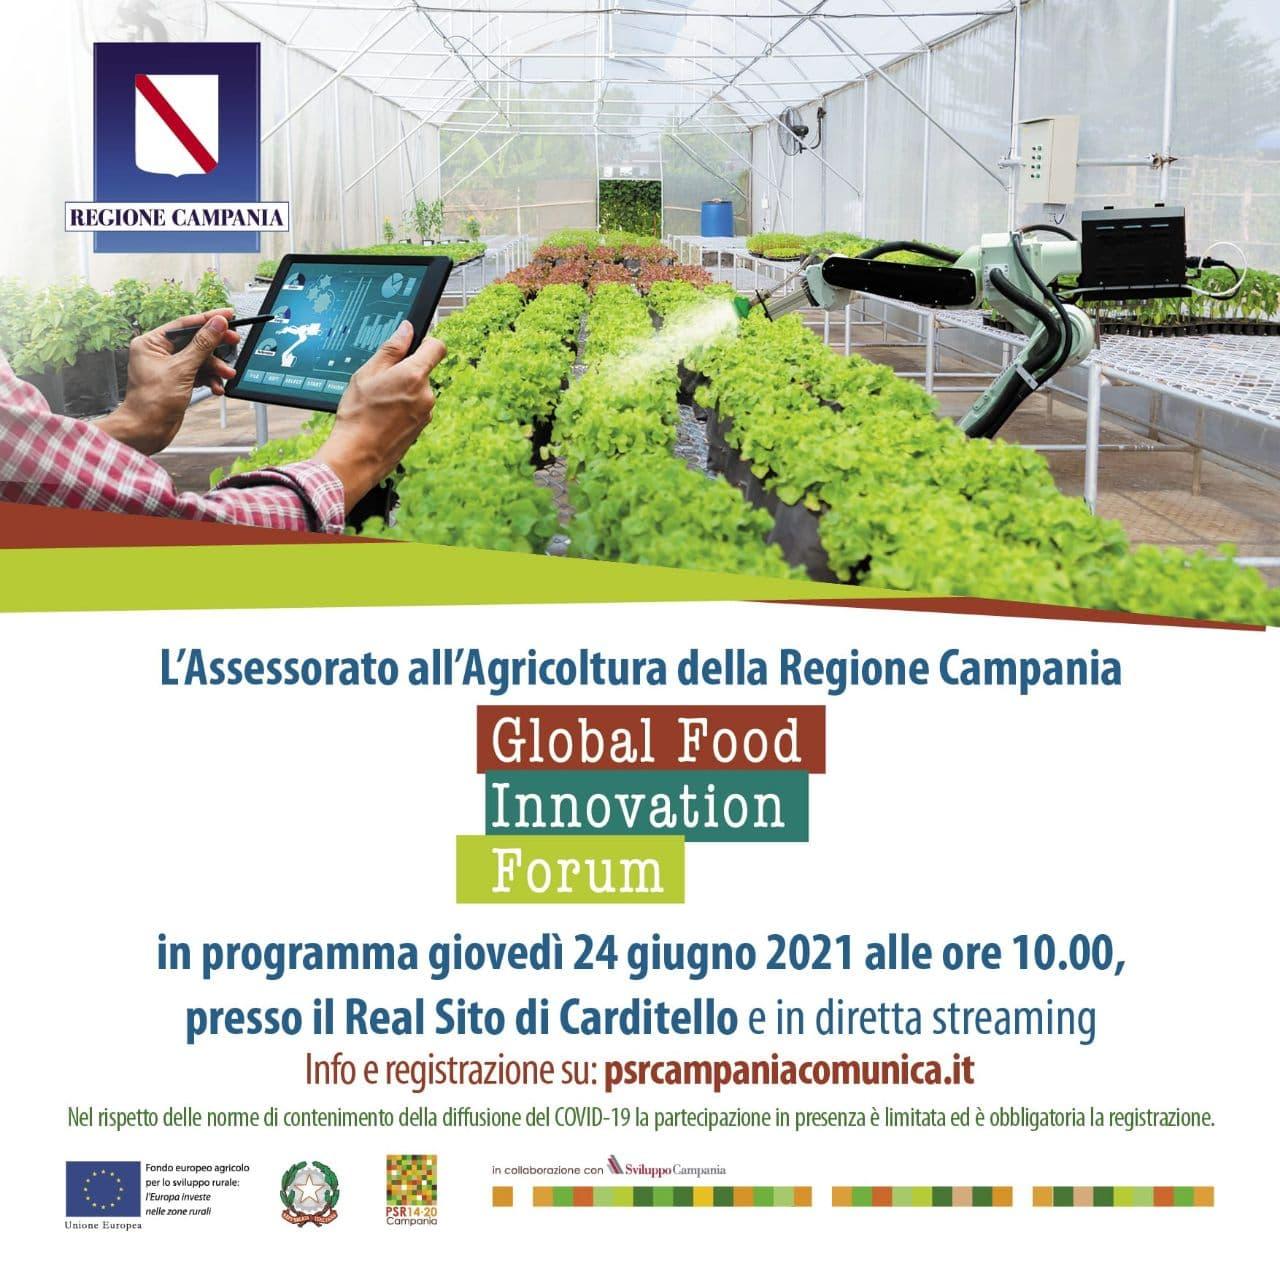 photo 2021 06 21 13 37 43 GLOBAL FOOD INNOVATION FORUM, NASCE LA PRIMA COMUNITA' DI PRATICA AGRIFOOD